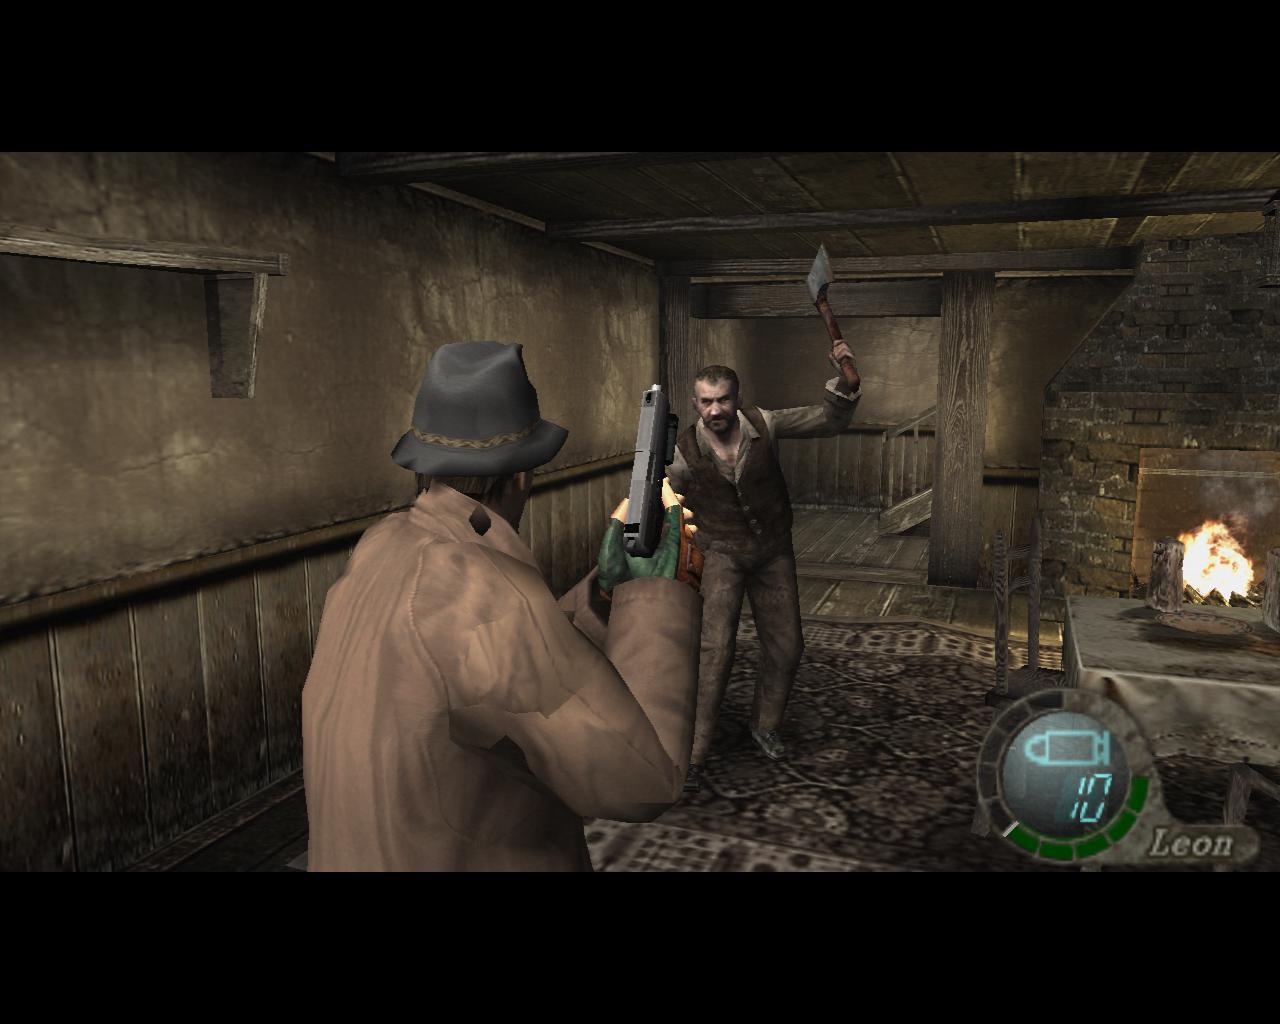 Resident Evil 4 Pc Laser Tweak Download - boostprogram